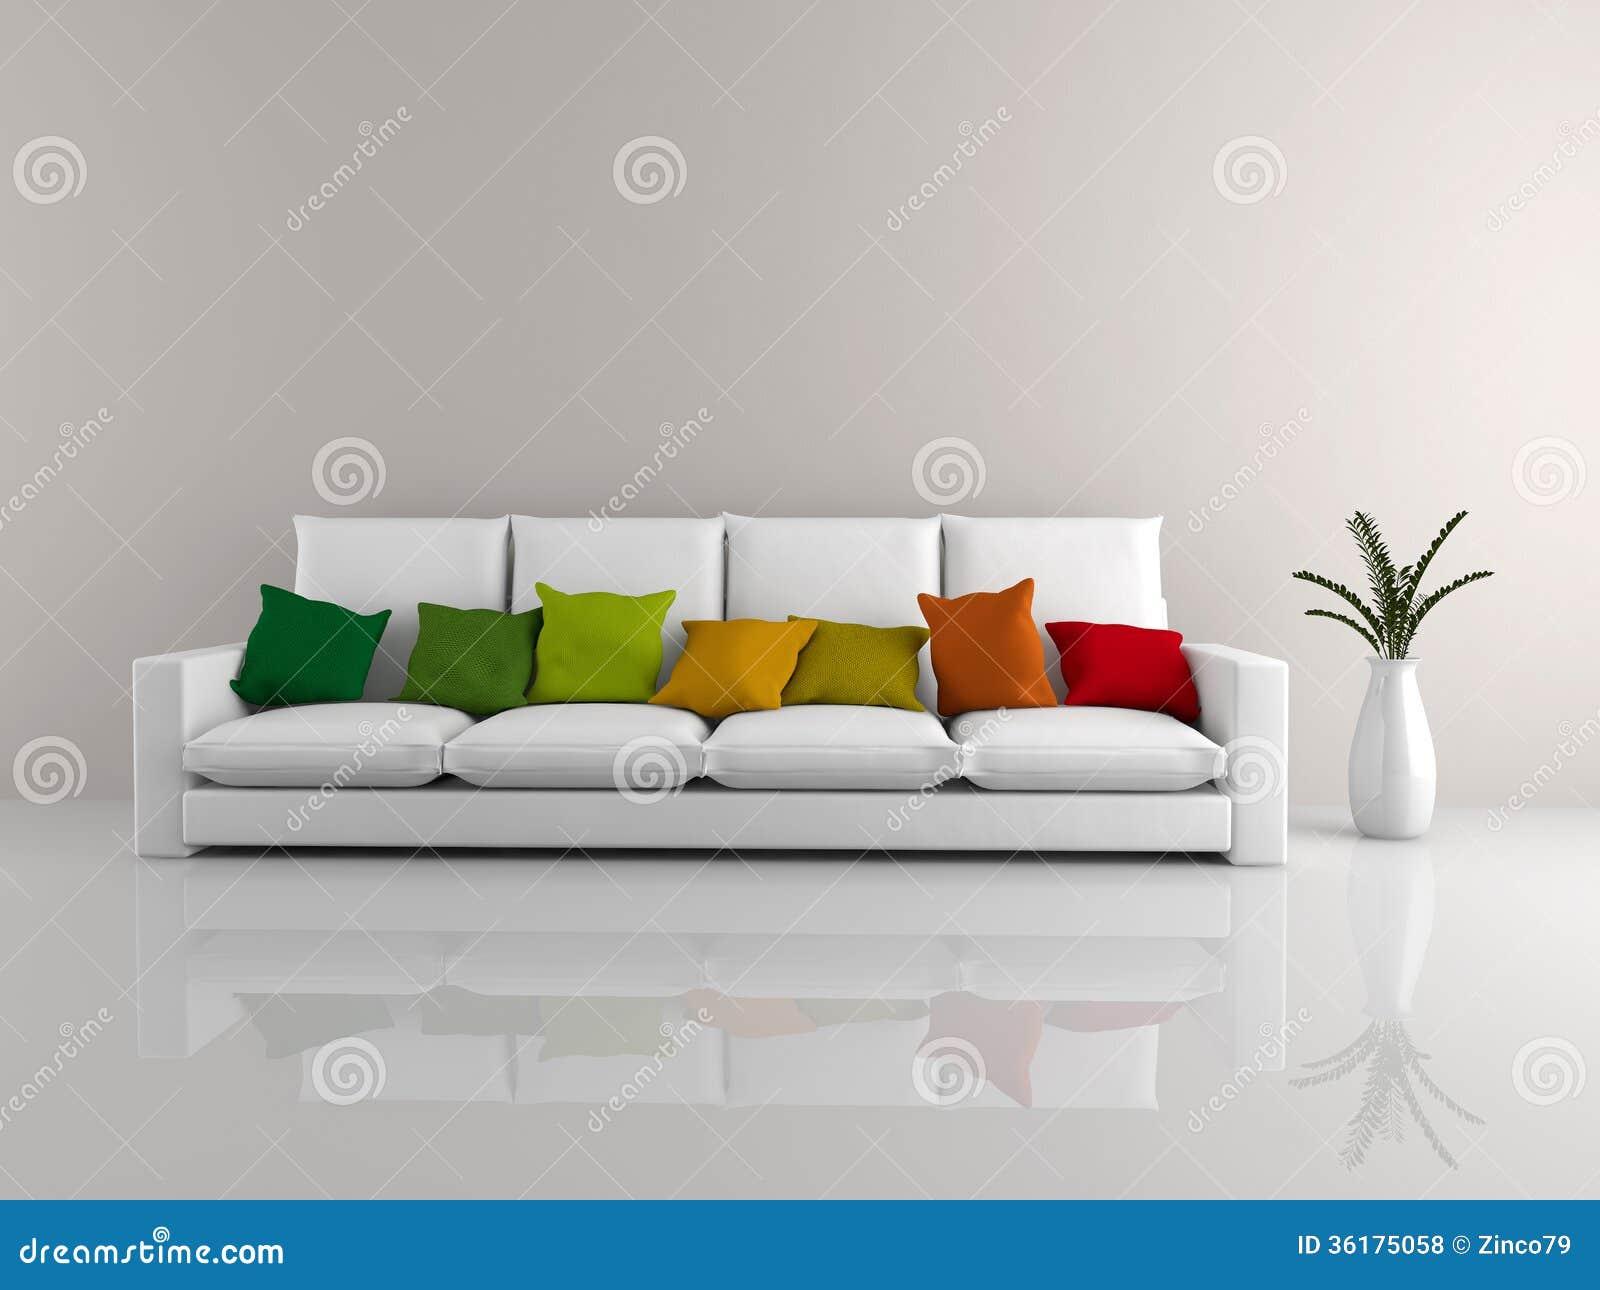 Minimalist Sofa White Royalty Free Stock Photos Image